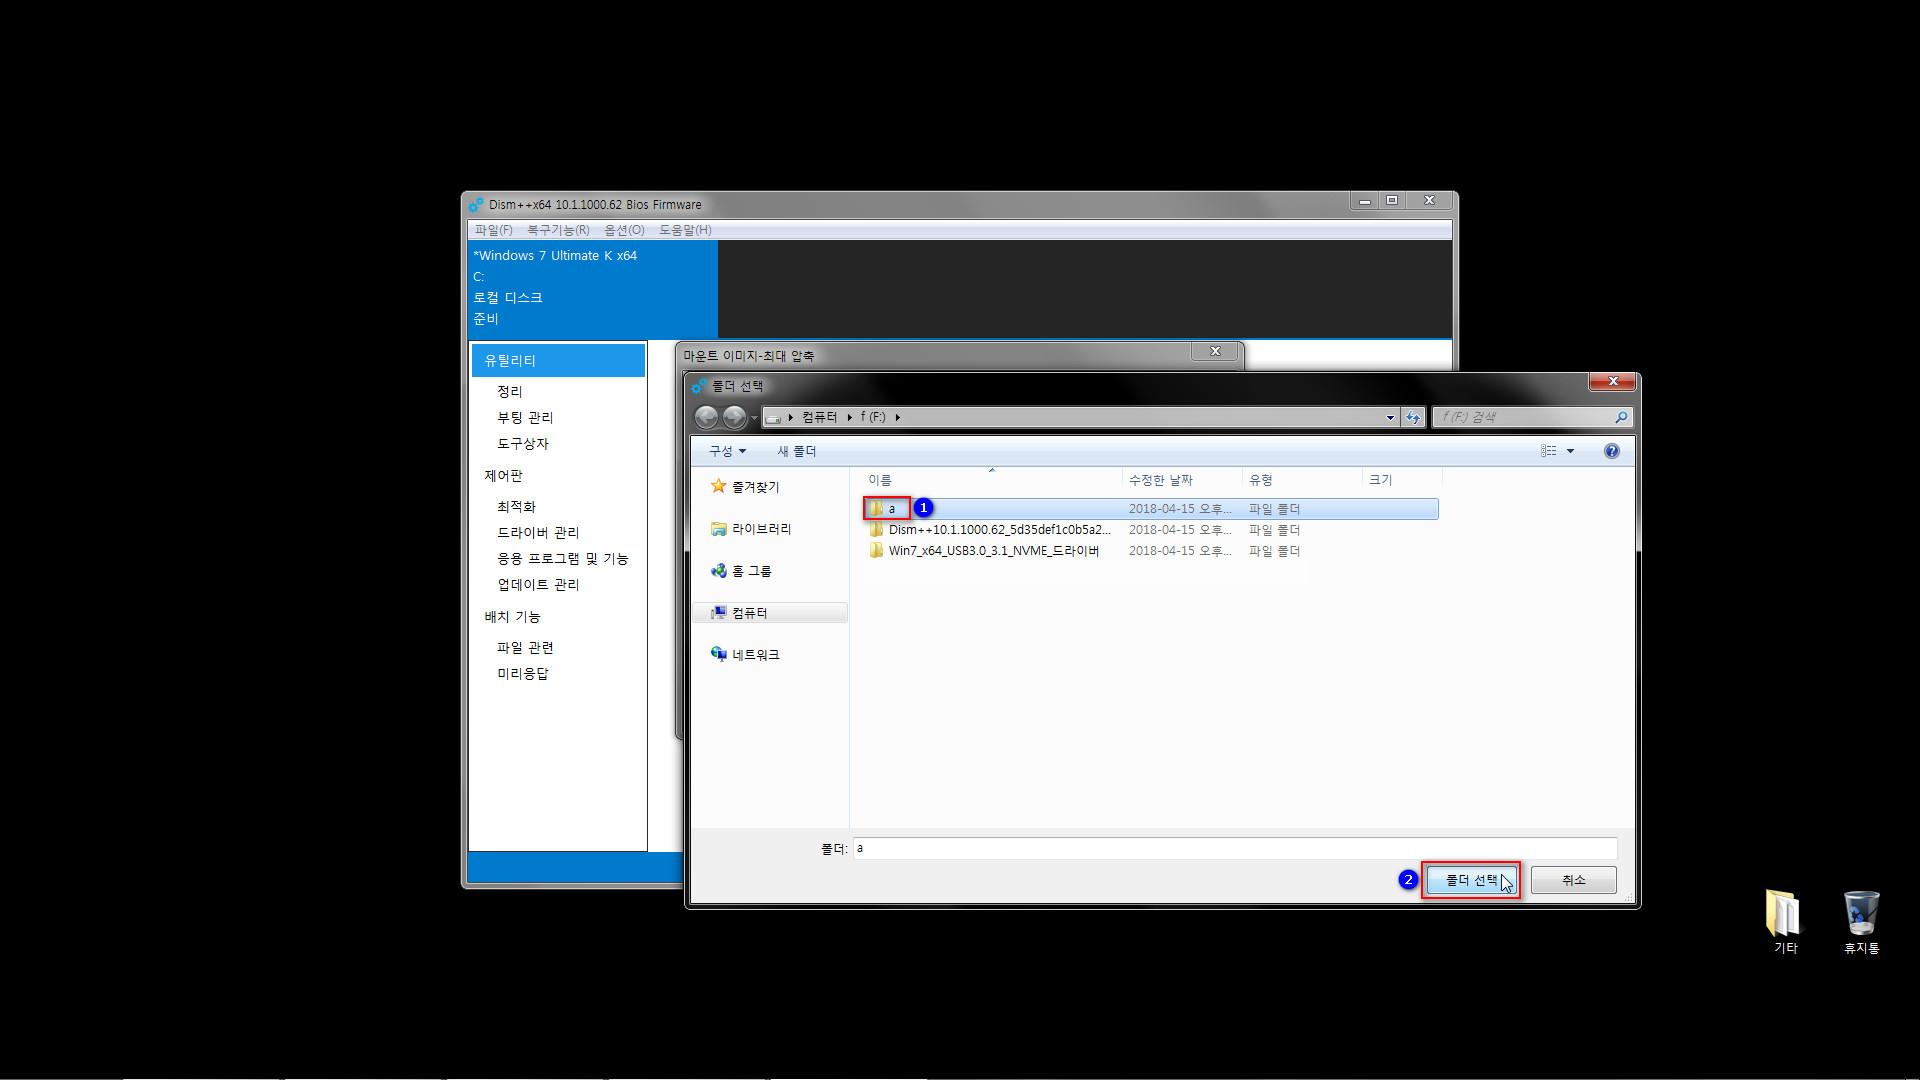 11. a폴더 한 번 클릭 선택 - 폴더 선택 클릭.jpg